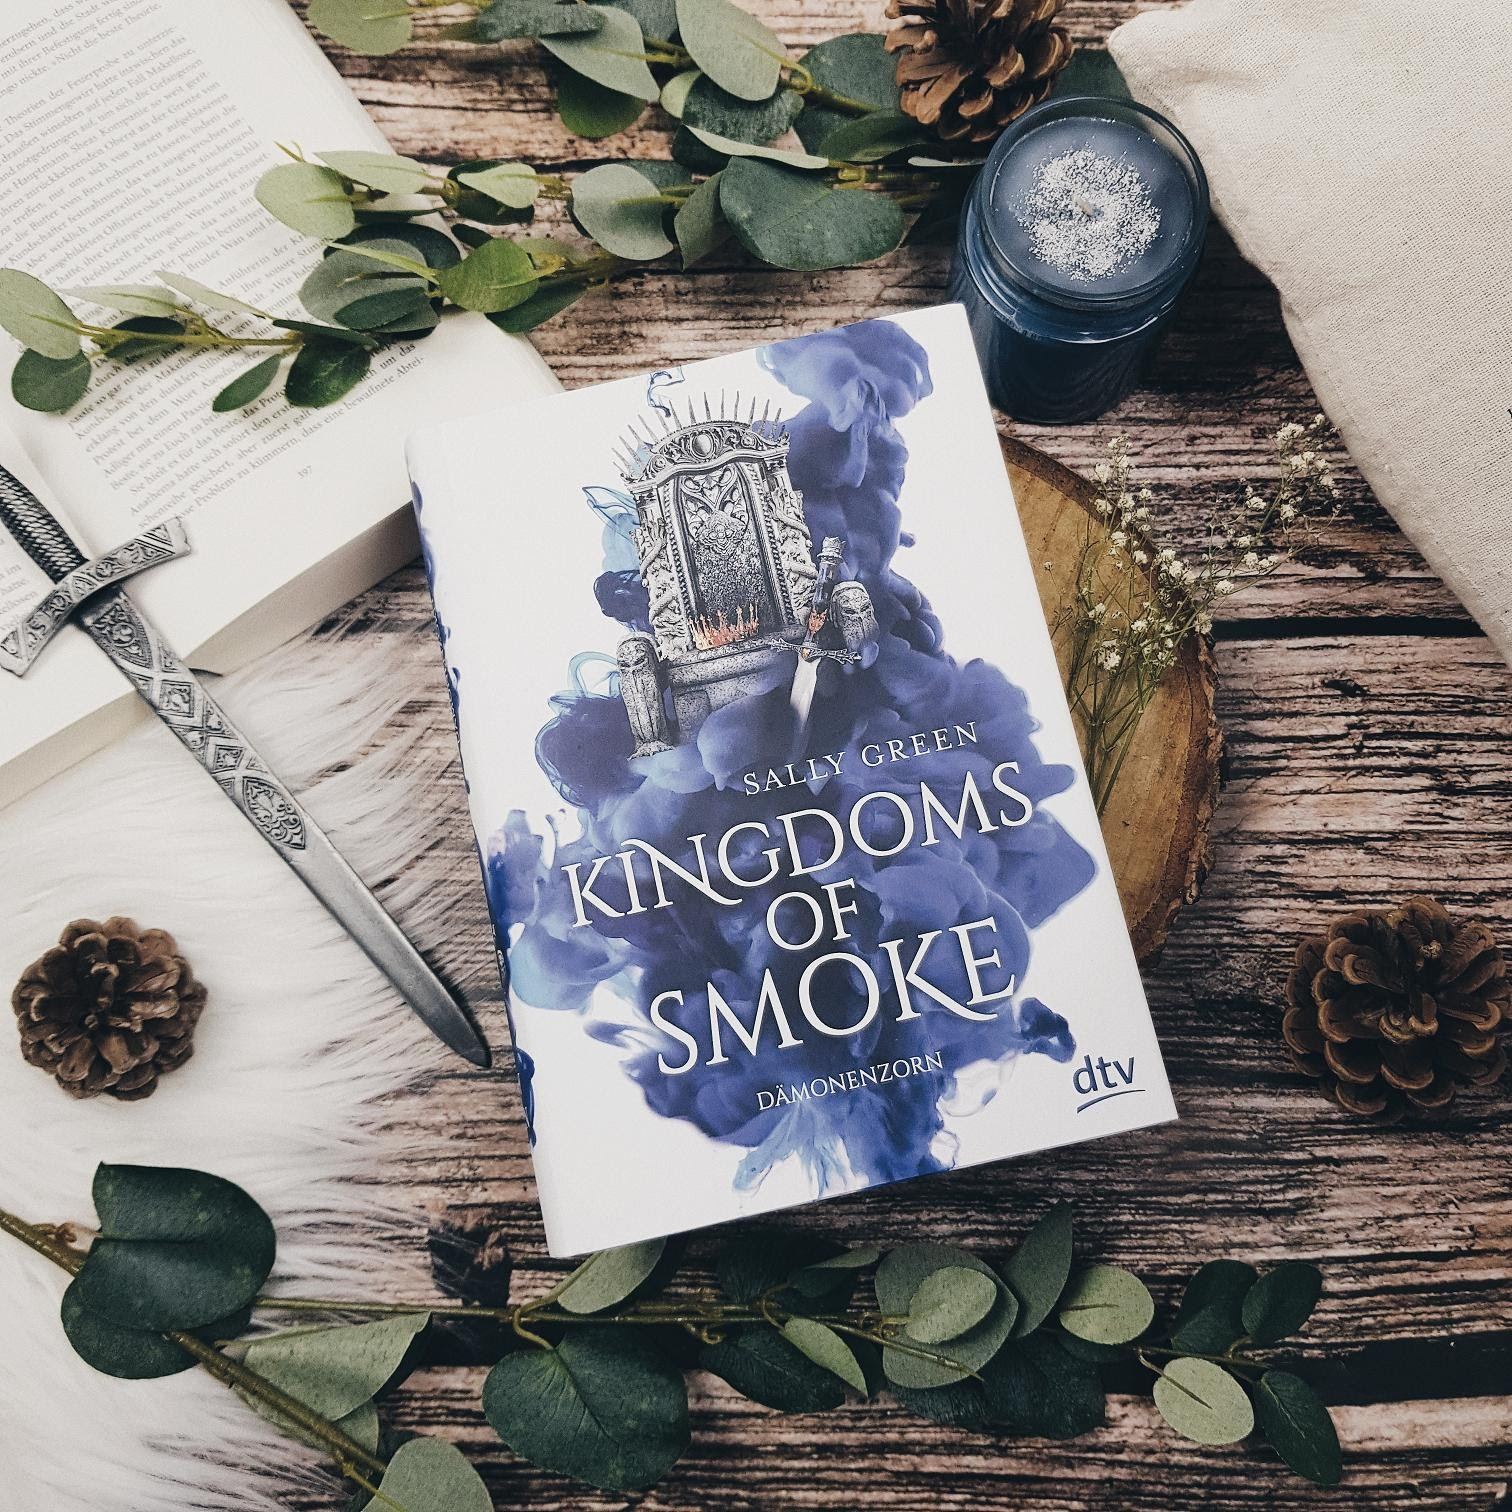 Bücherblog. Rezension. Buchcover. Kingdoms of Smoke - Dämonenzorn (Bd.2)  von Sally Green. Fantasy, Jugendbuch. dtv Verlag. ©prettytigerbuch